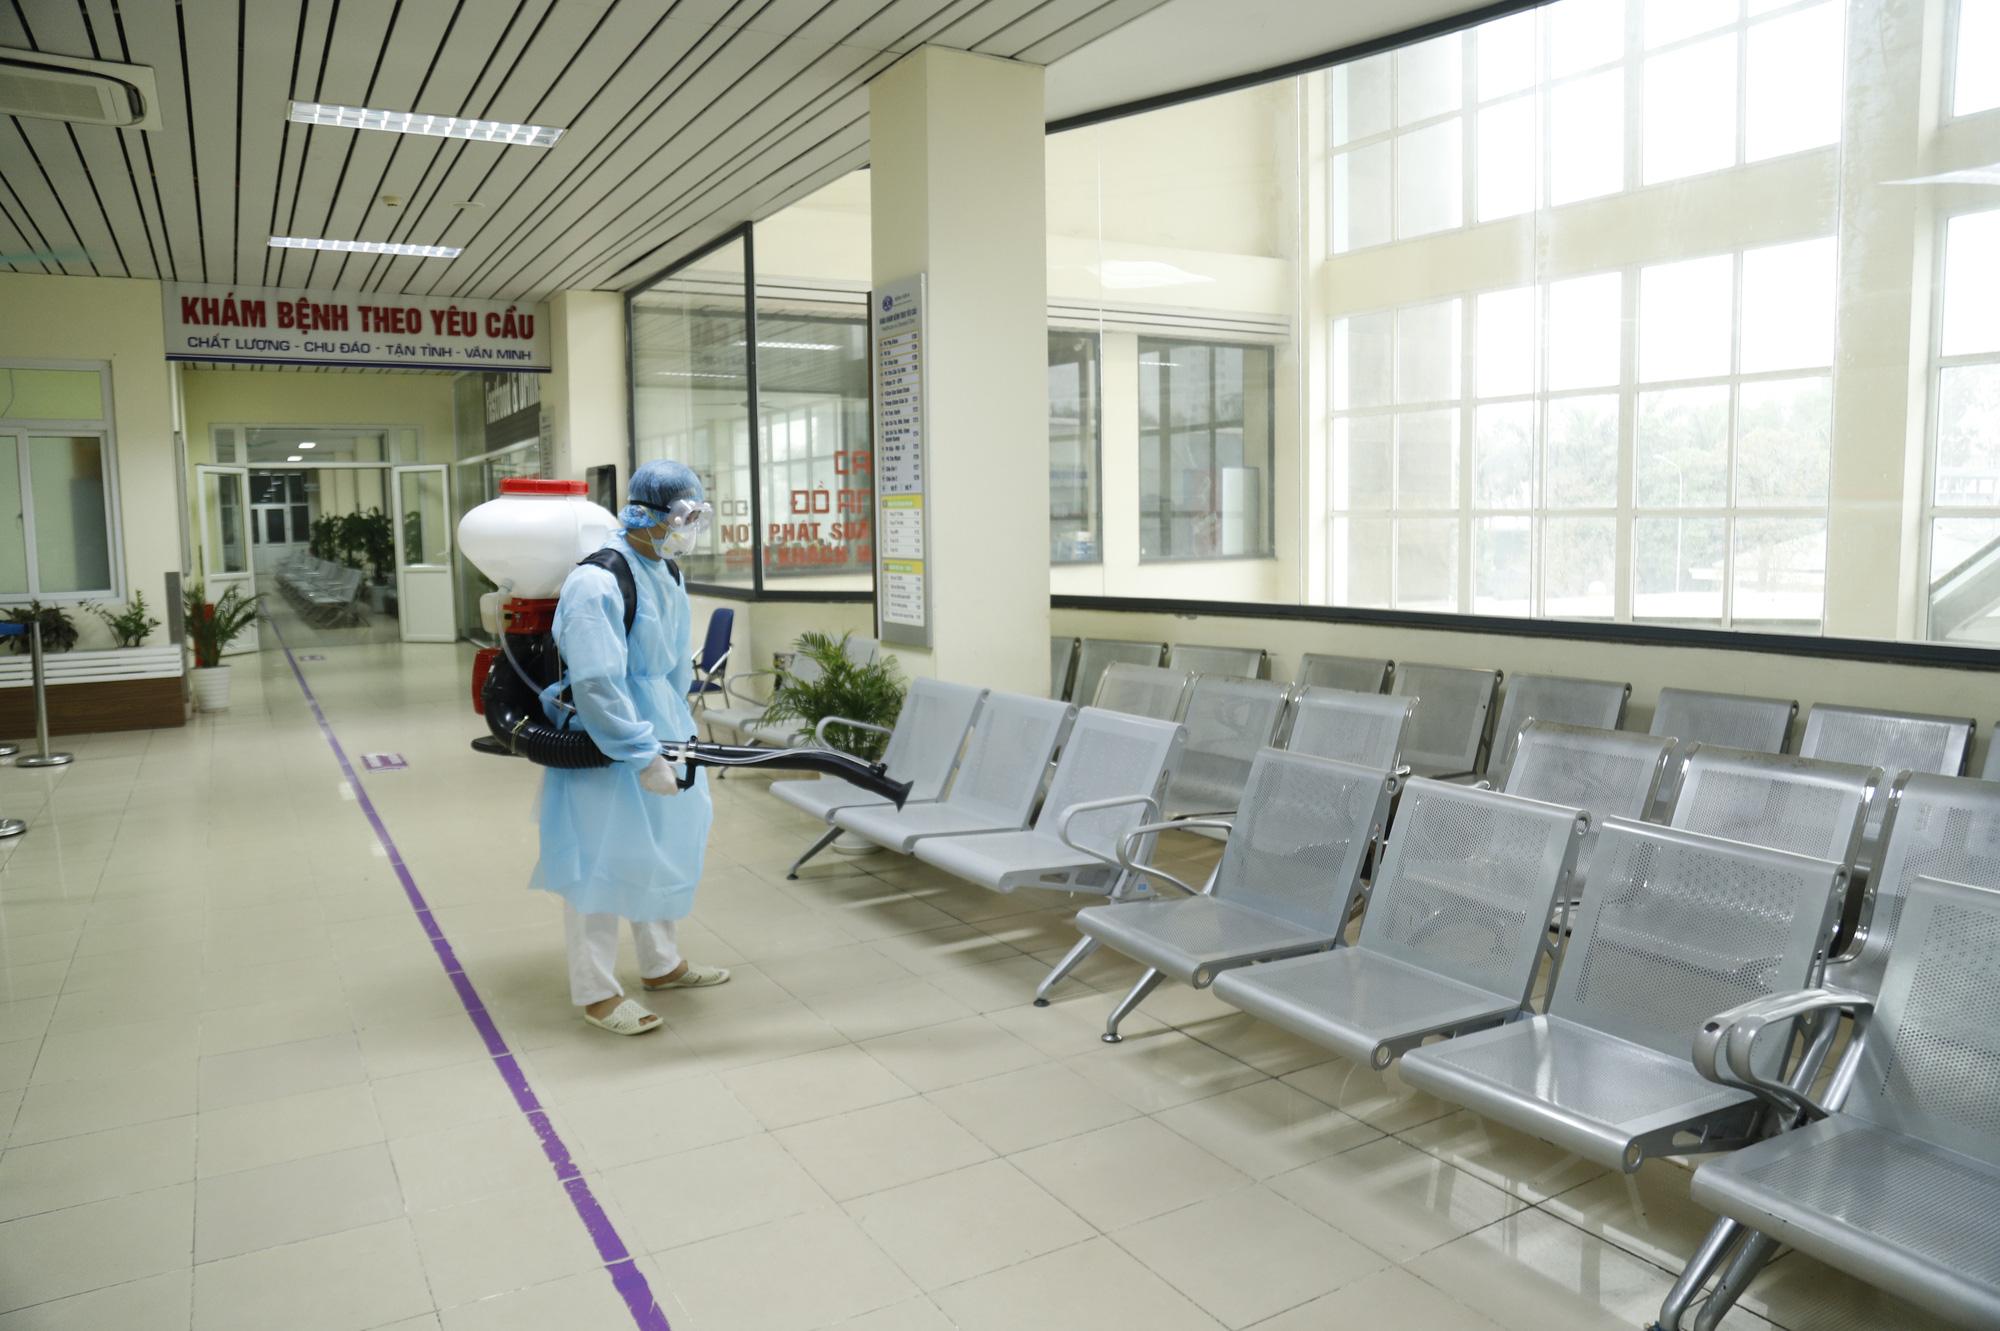 Vietnam calls up medical students, retired doctors in coronavirus fight